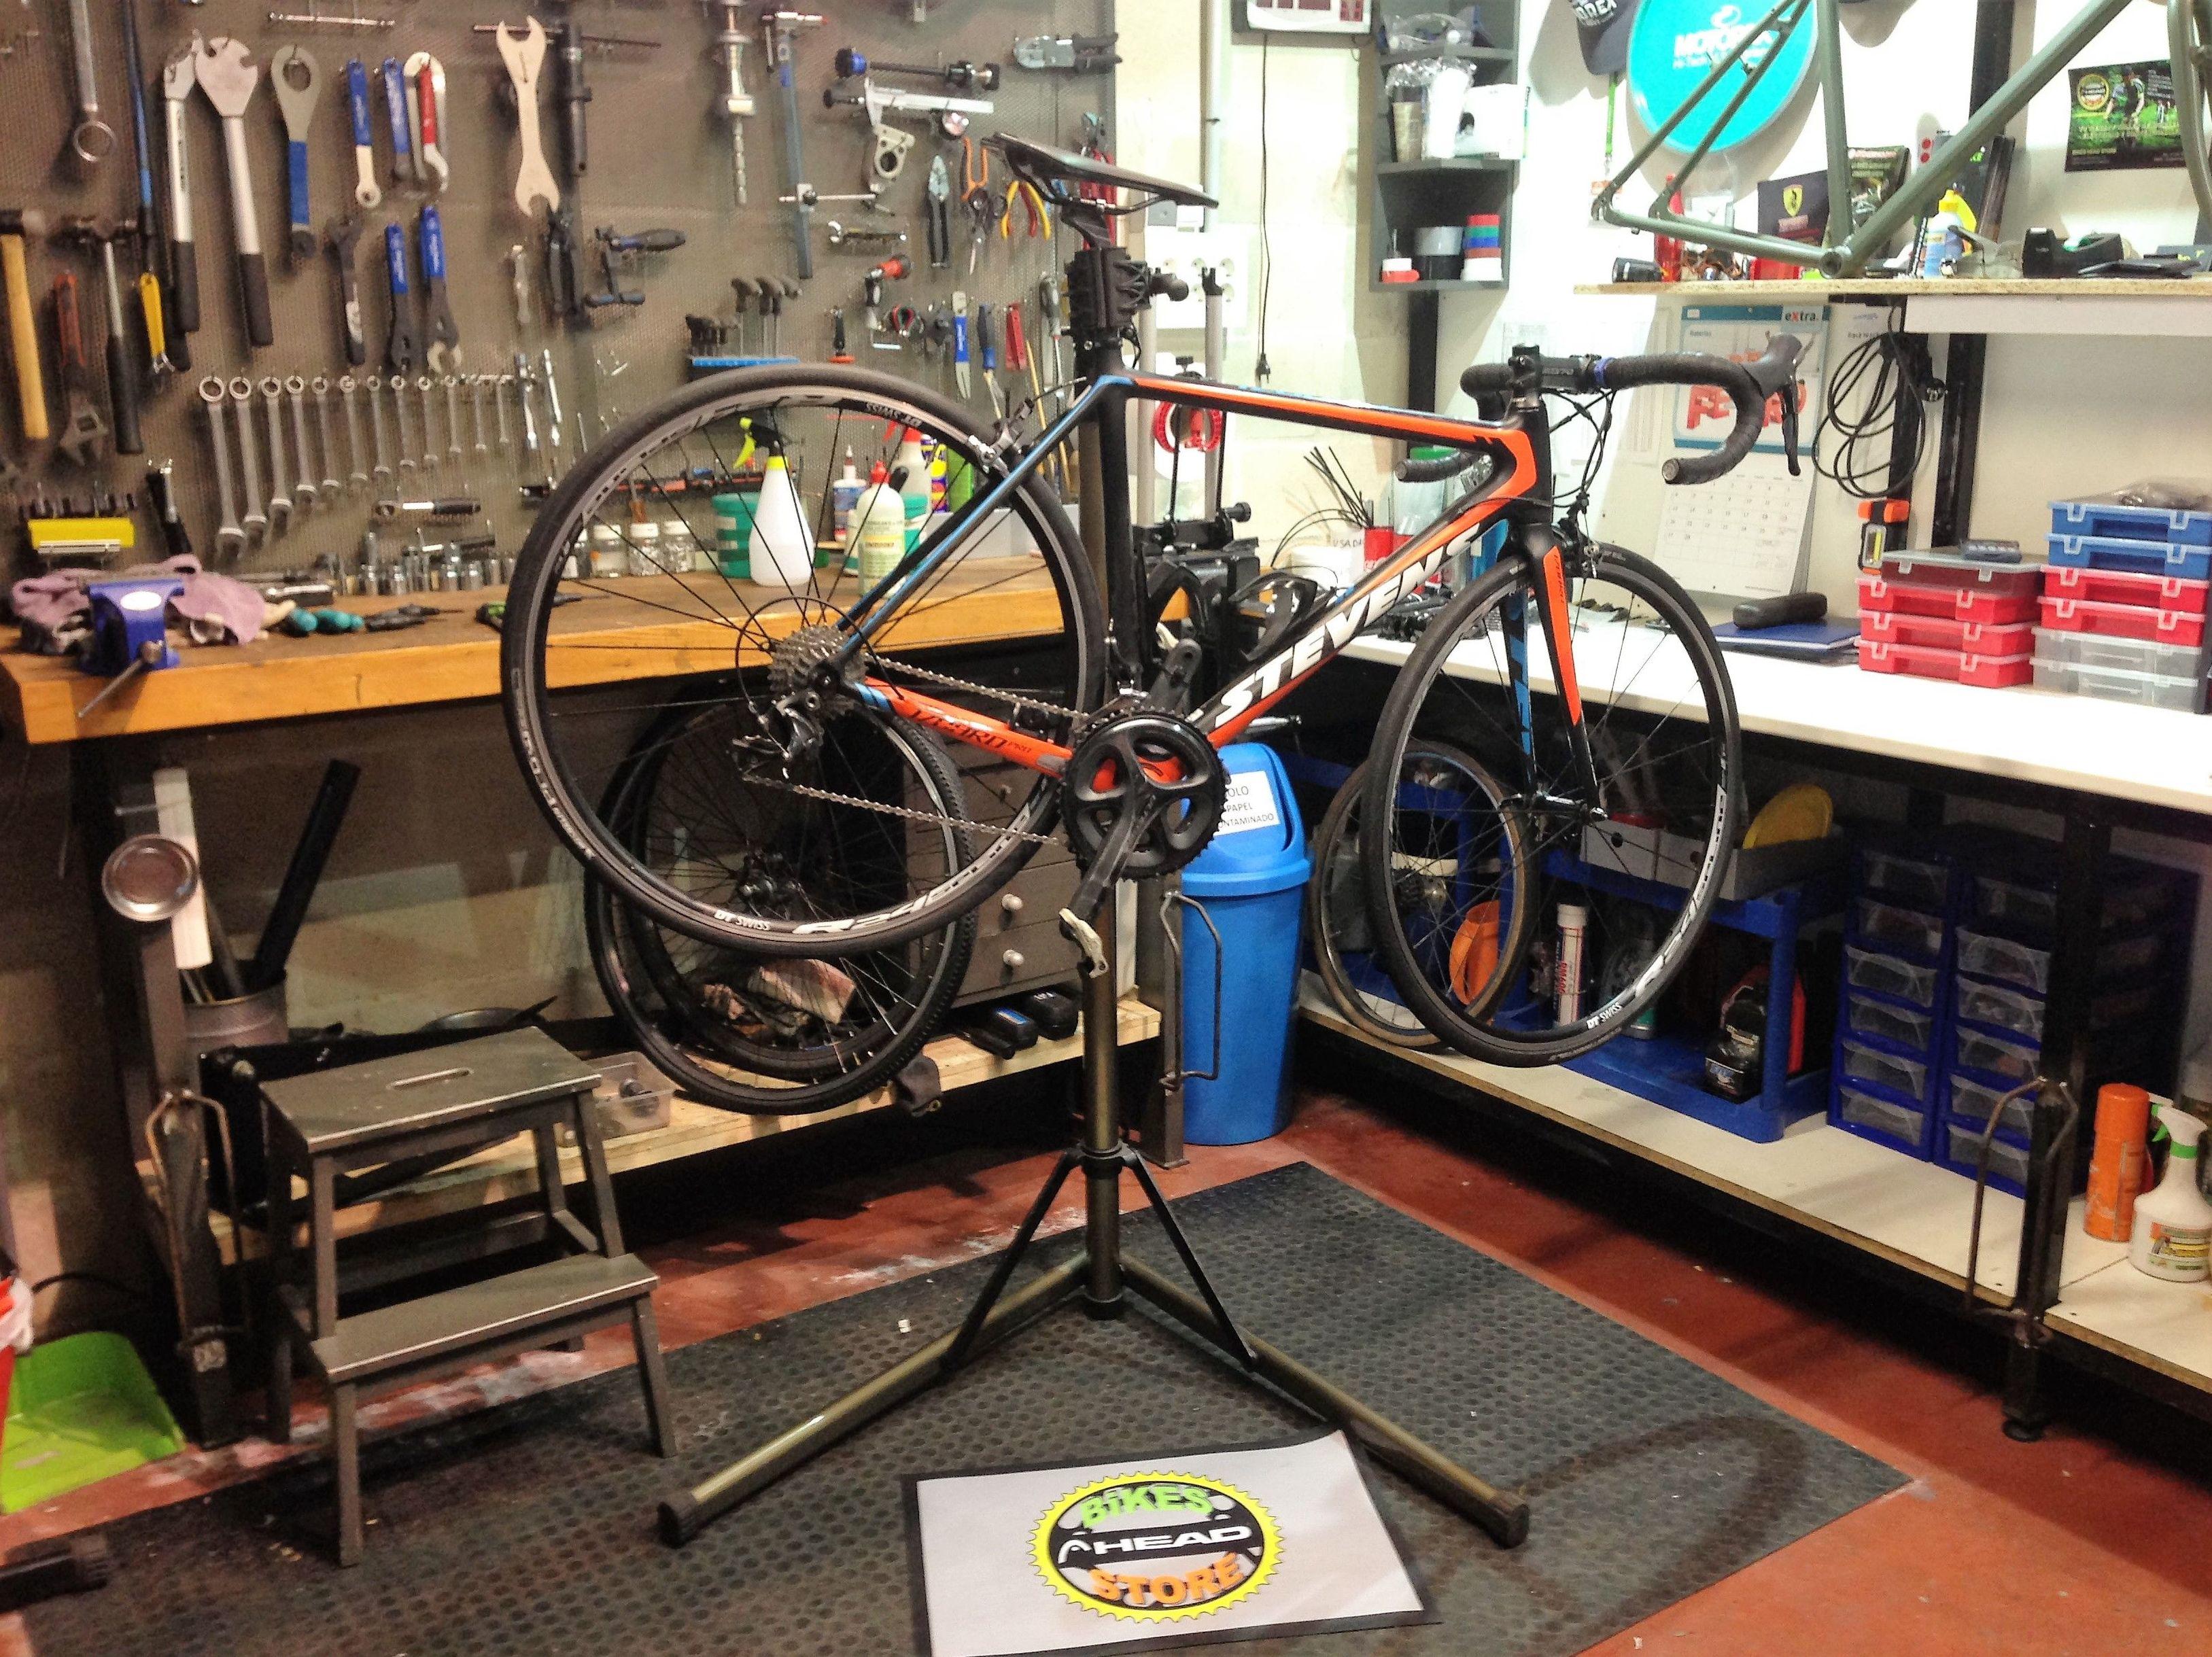 Bicileta Stevens Izoard PRO en nuestro taller de bicicletas